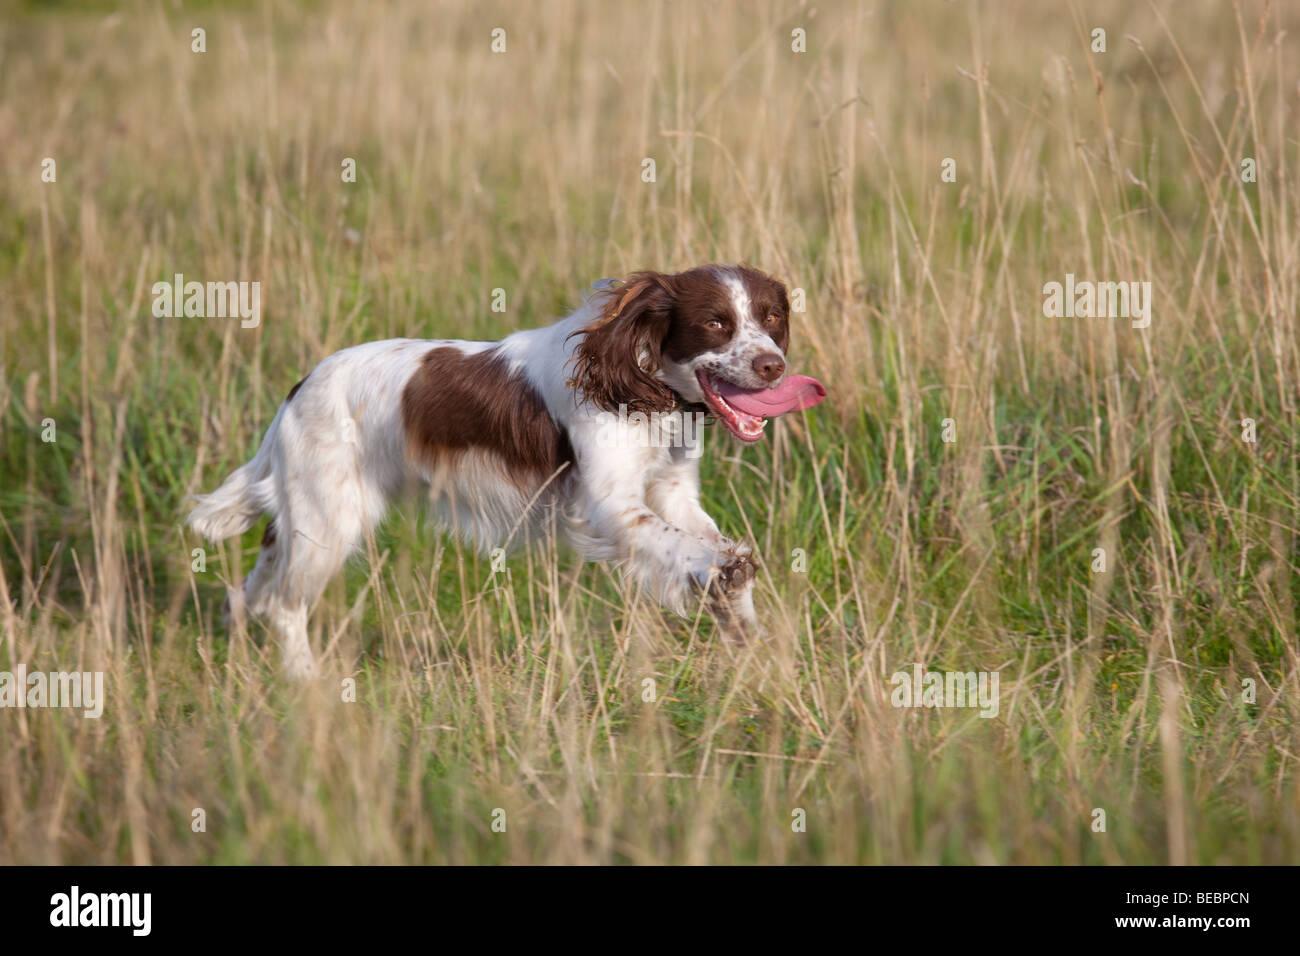 A breathless English Springer Spaniel running through grass - Stock Image